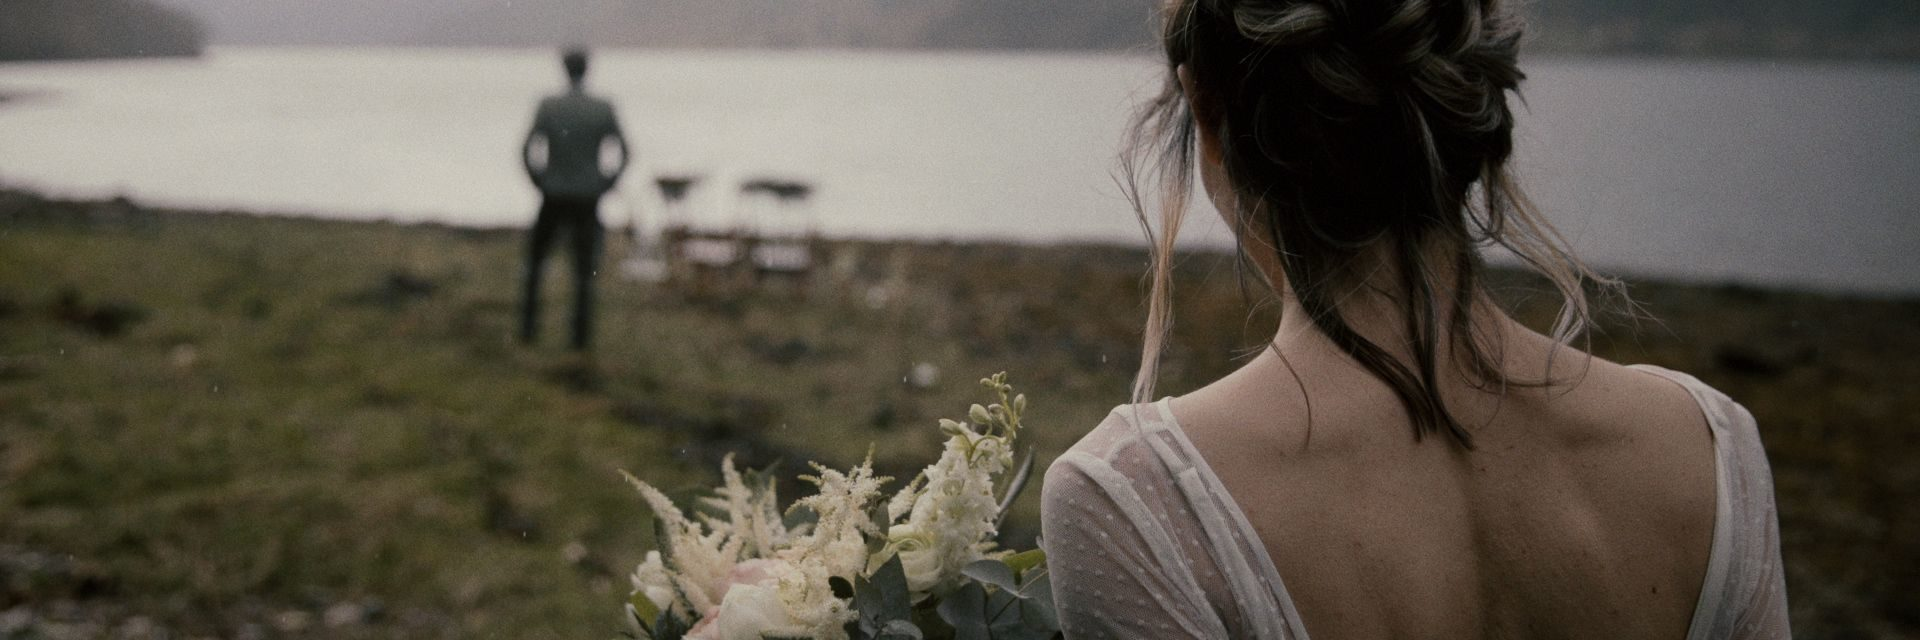 lisbon-wedding-videographer-cinemate-films-02